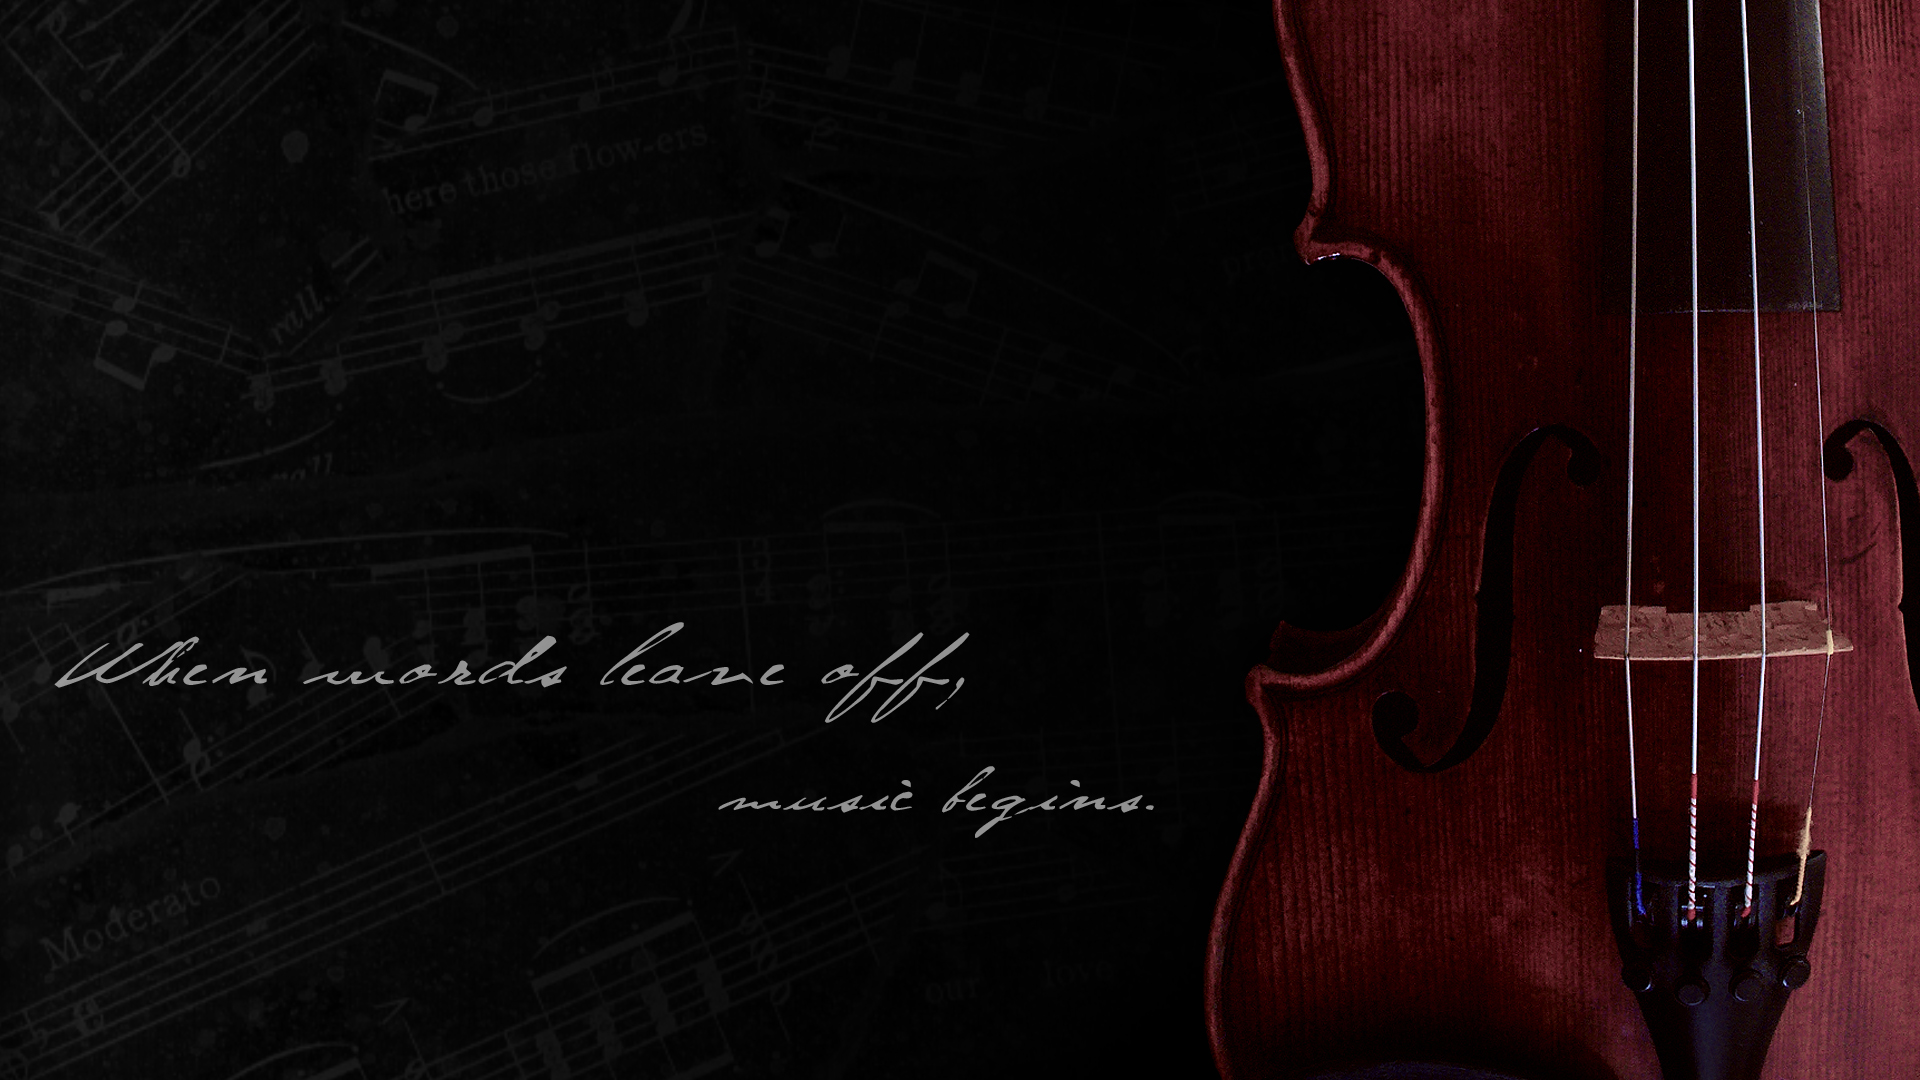 violin wallpaper by xerix93 on deviantart